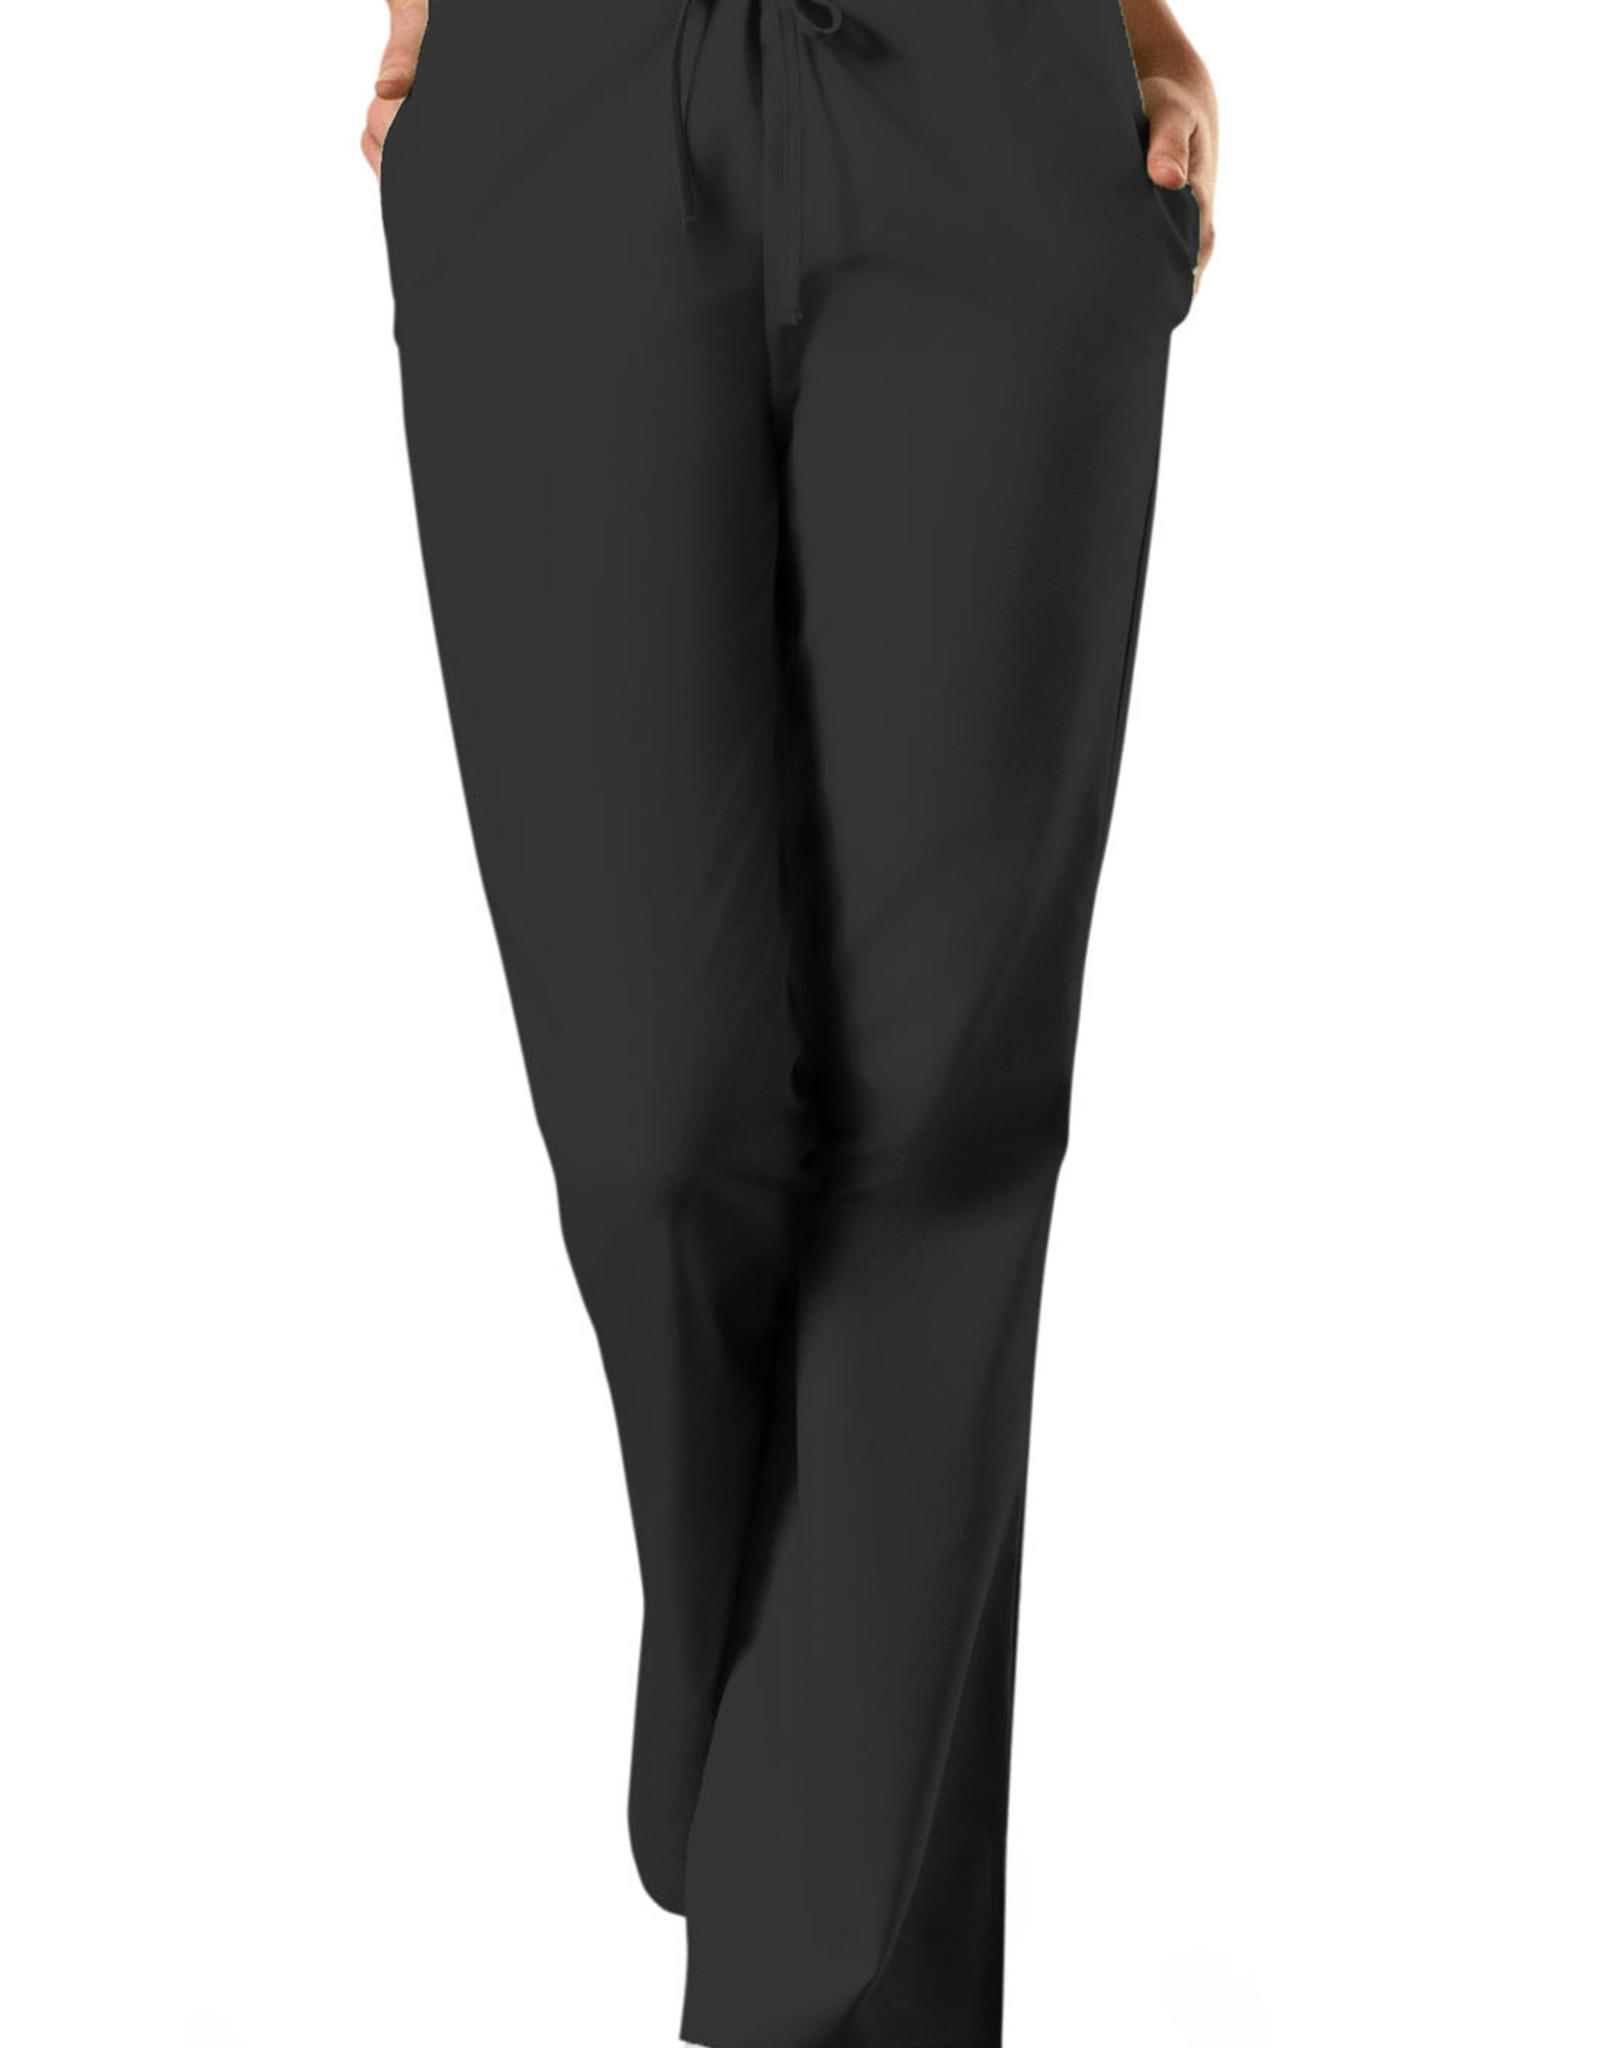 Natural Rise Flare Leg Drawstring Pant in Black